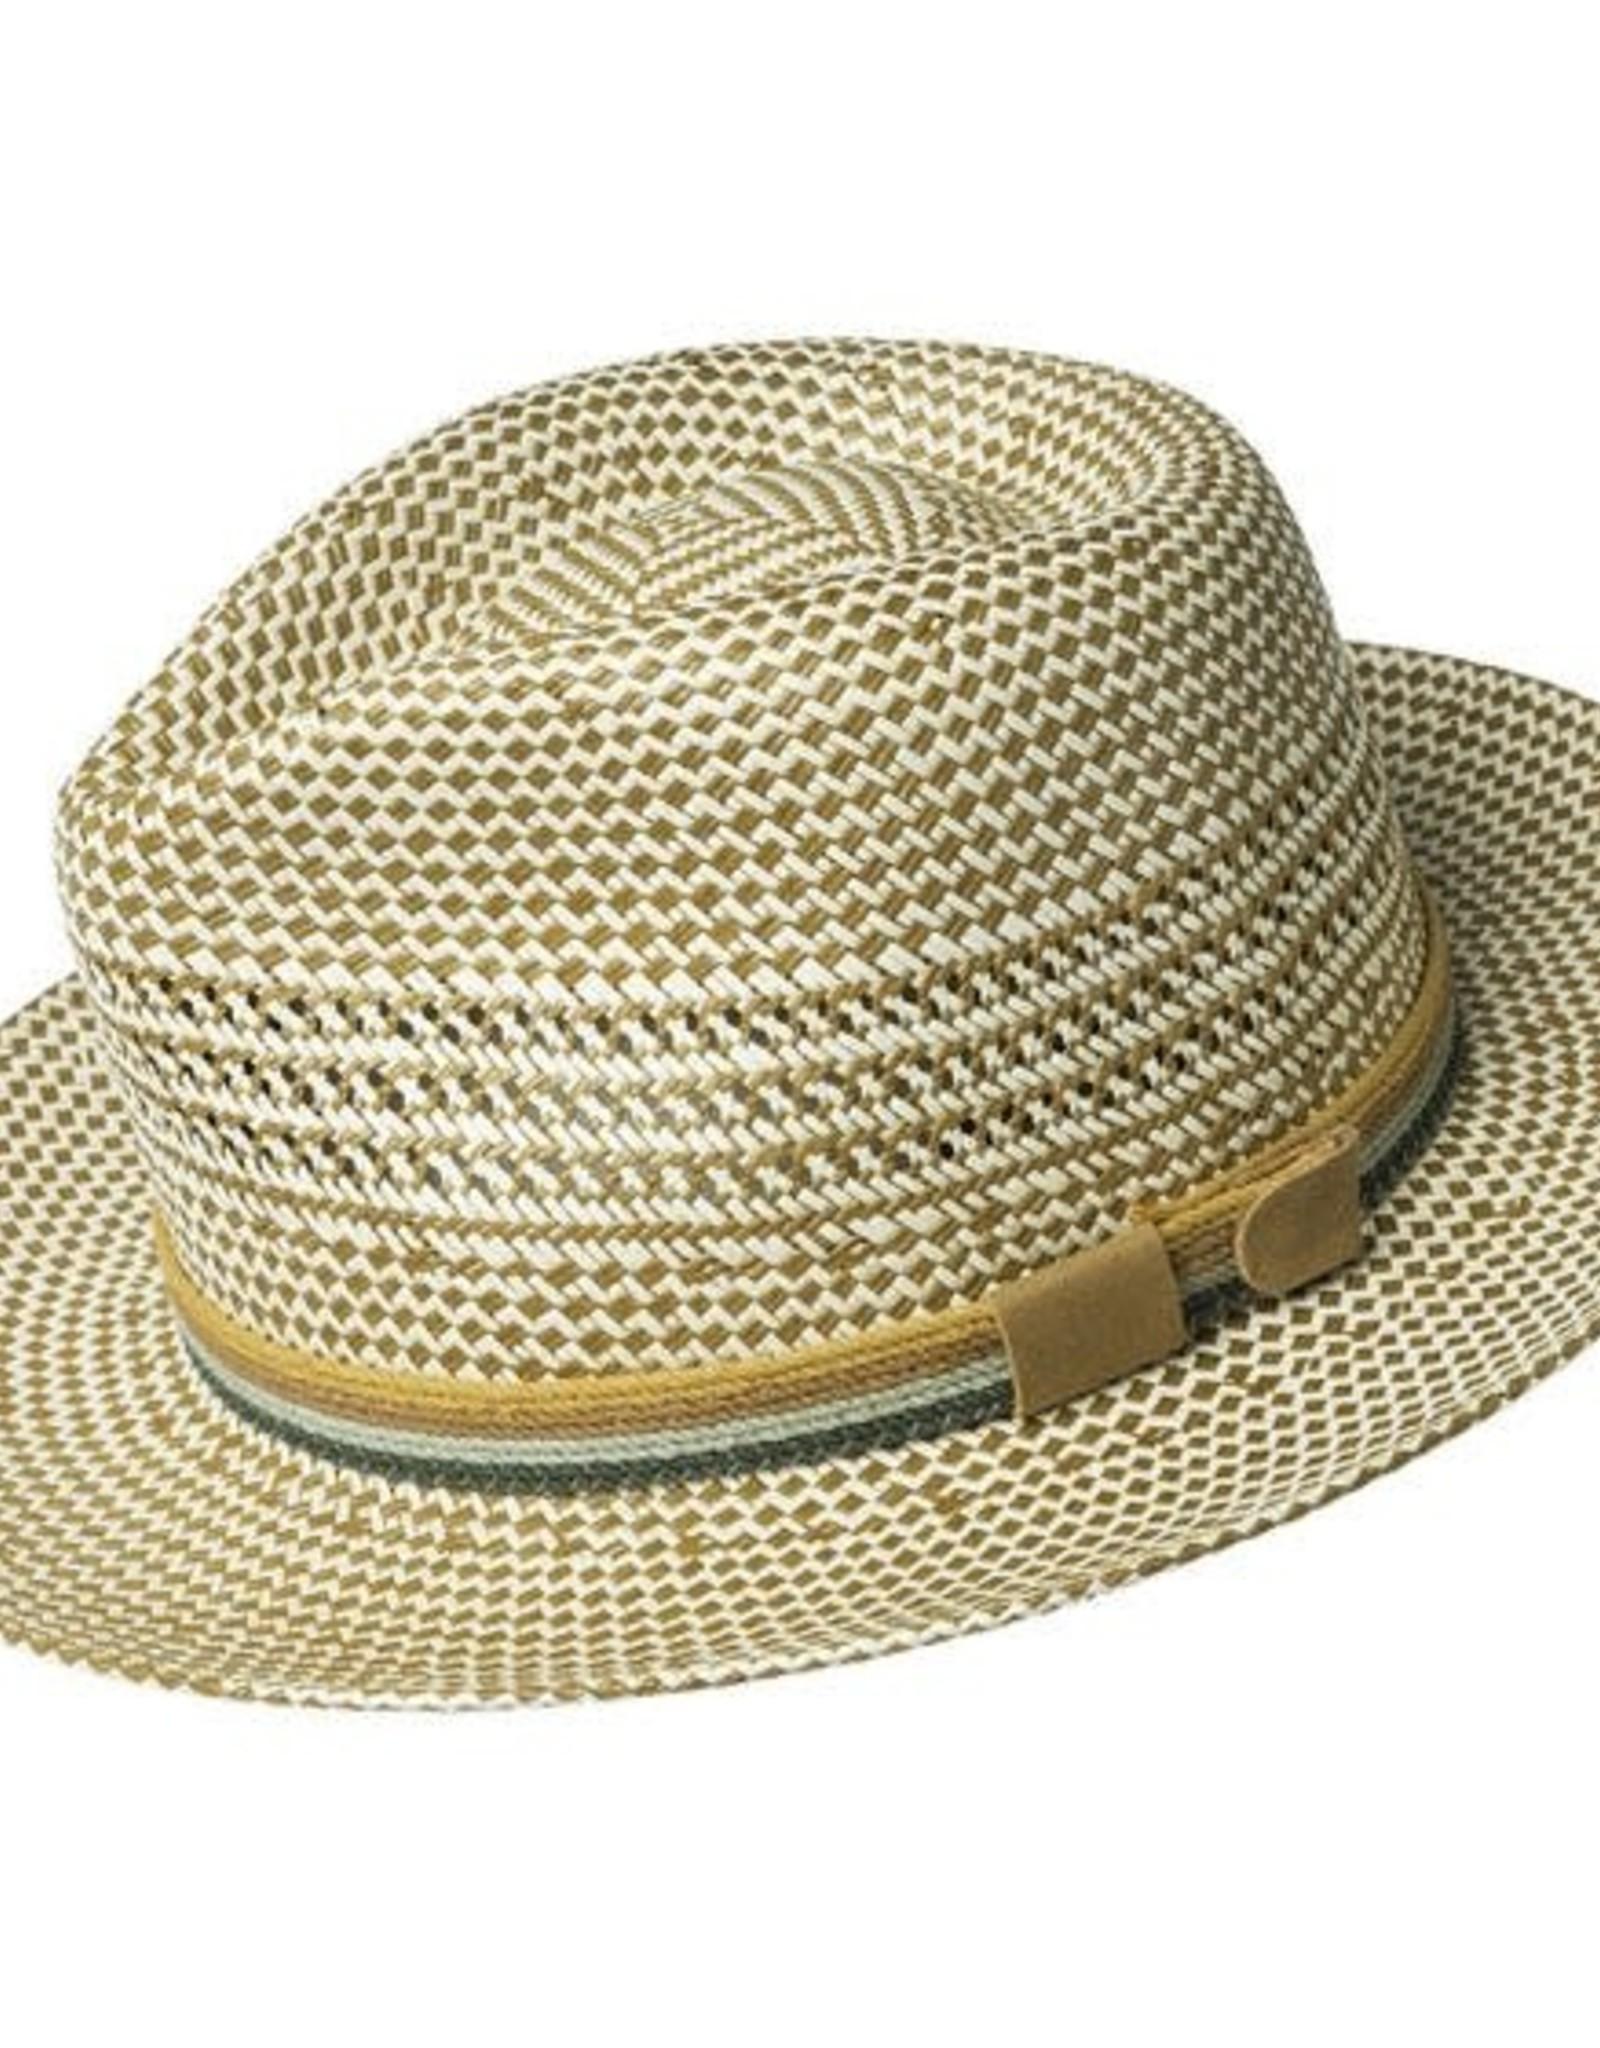 Bailey Hat Co. HAT-FEDORA-RUDI, SEPIA NATURAL